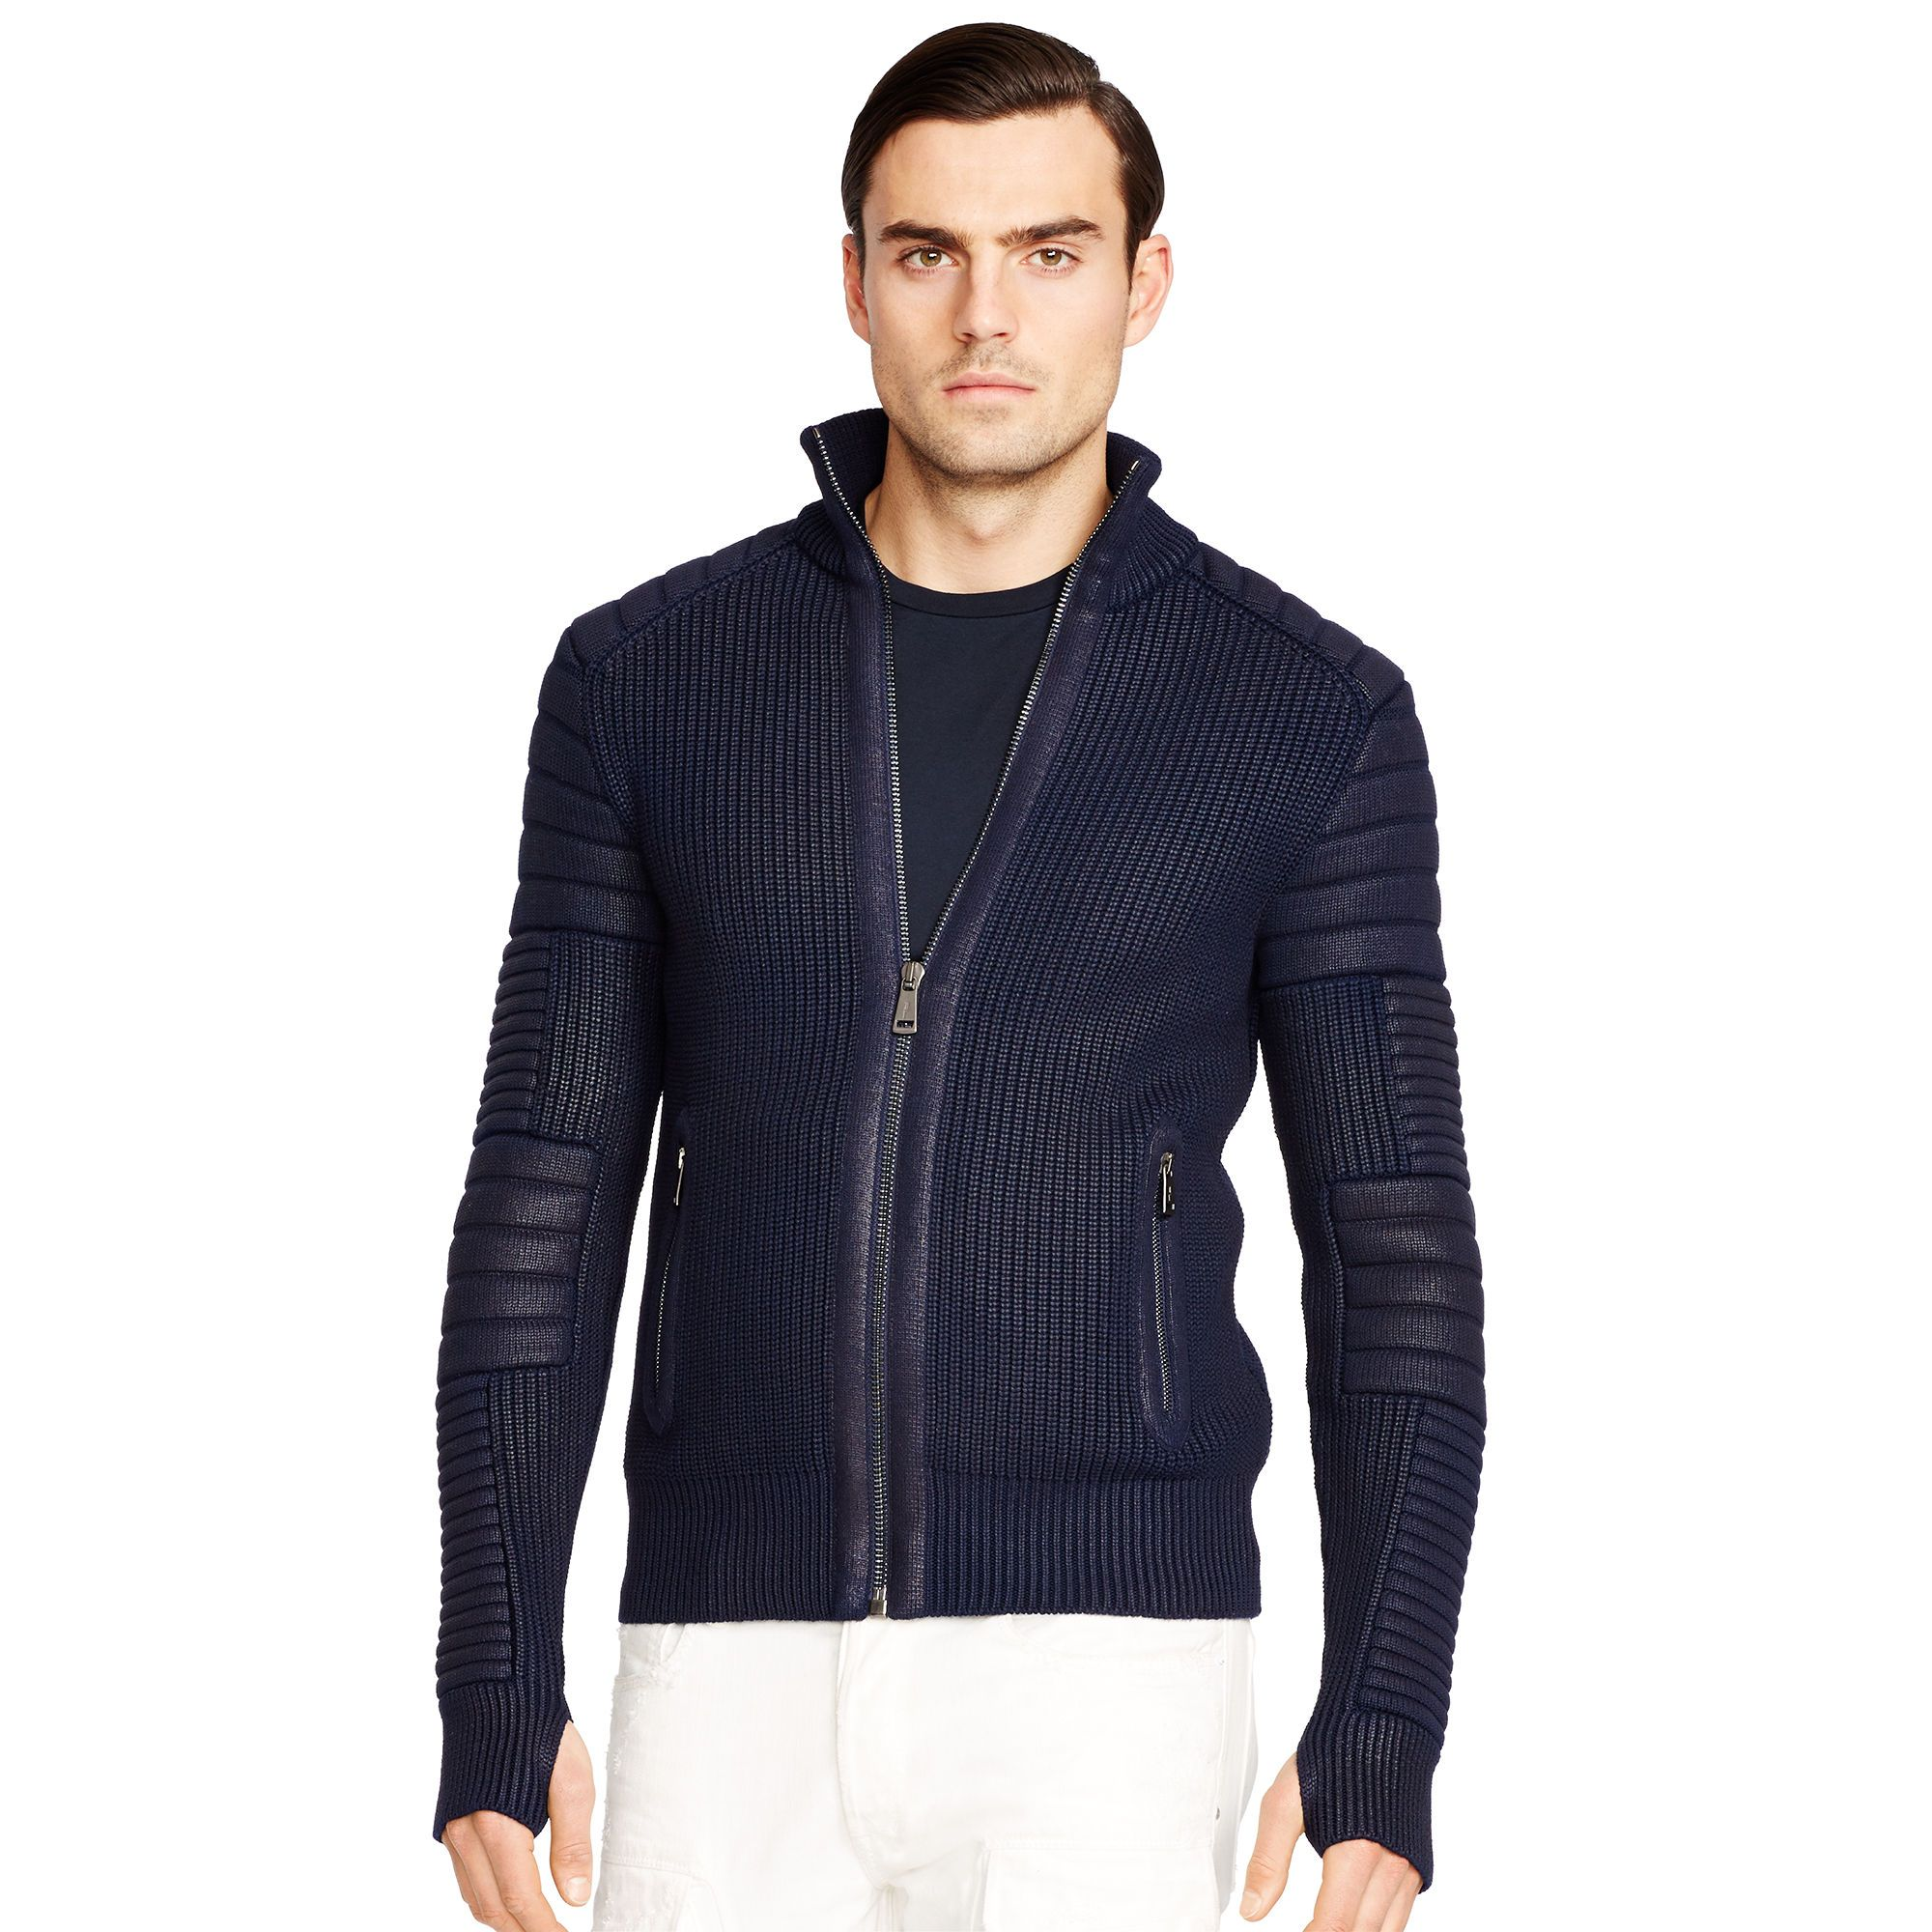 Ralph Lauren Black Label Rubberized Merino Wool Sweater in Blue for Men  (Aviator Navy)